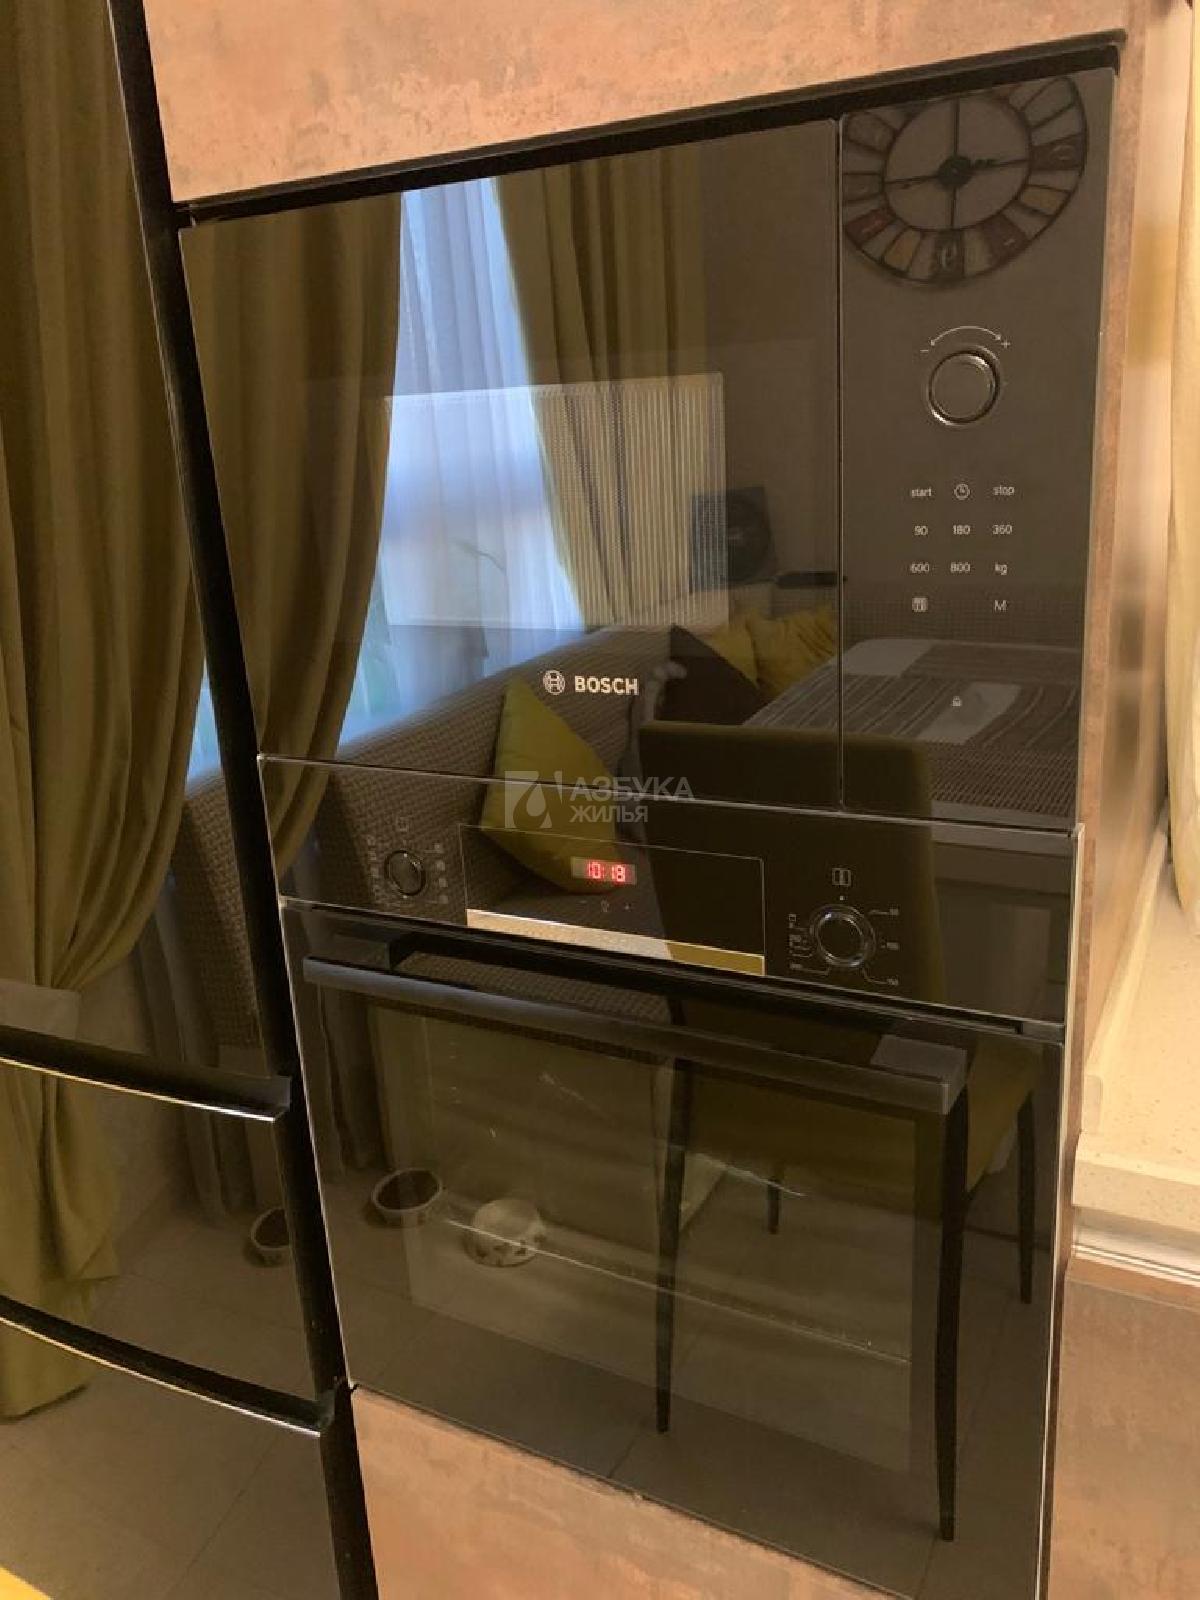 Фото №2 - 3-комнатная квартира, Москва, Поляны улица 5, метро Улица Скобелевская